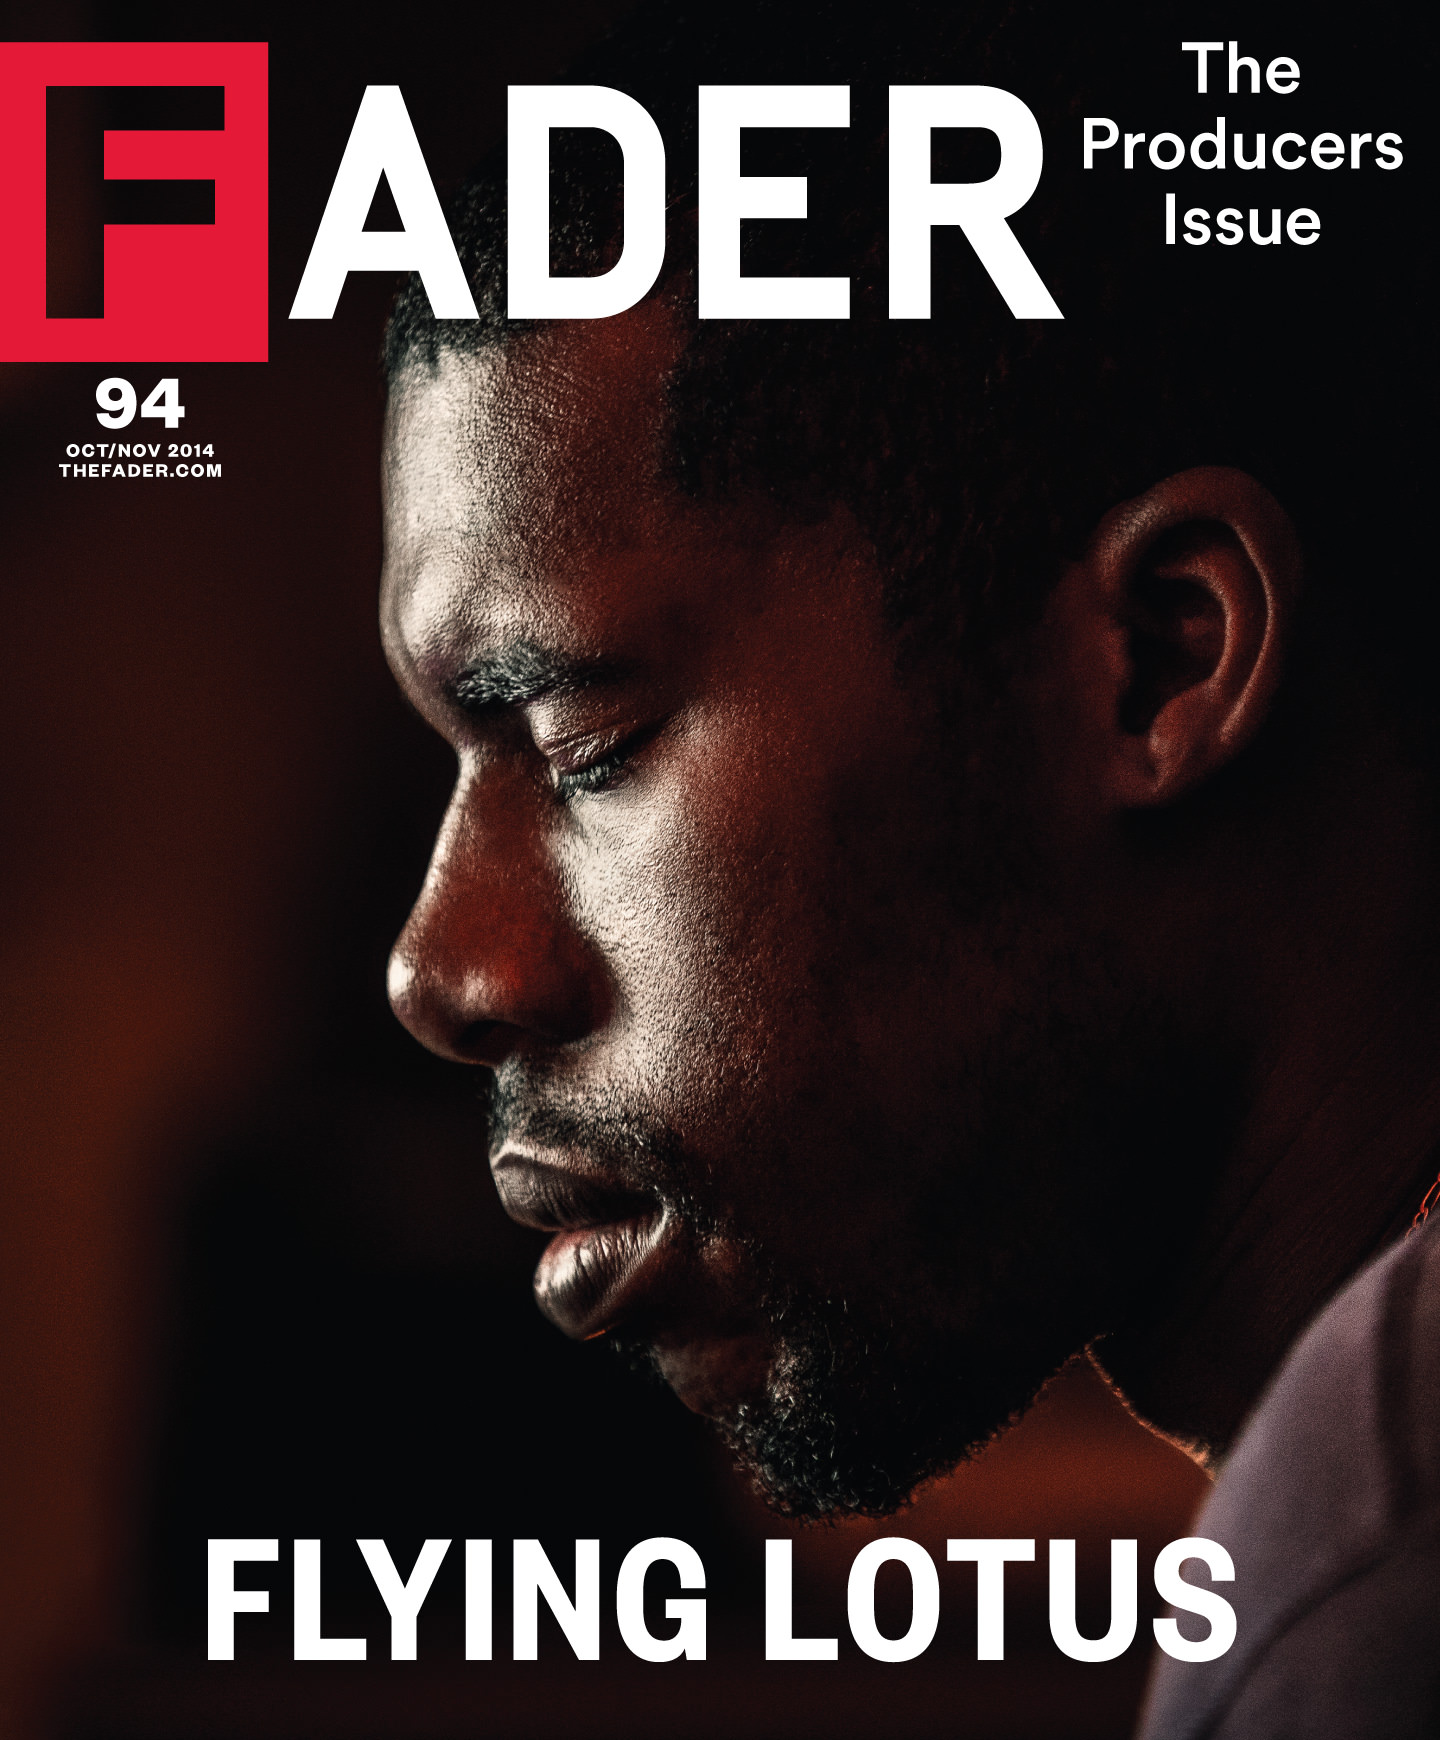 Flying Lotus Fader cover story Andy Beta Mark Mahaney